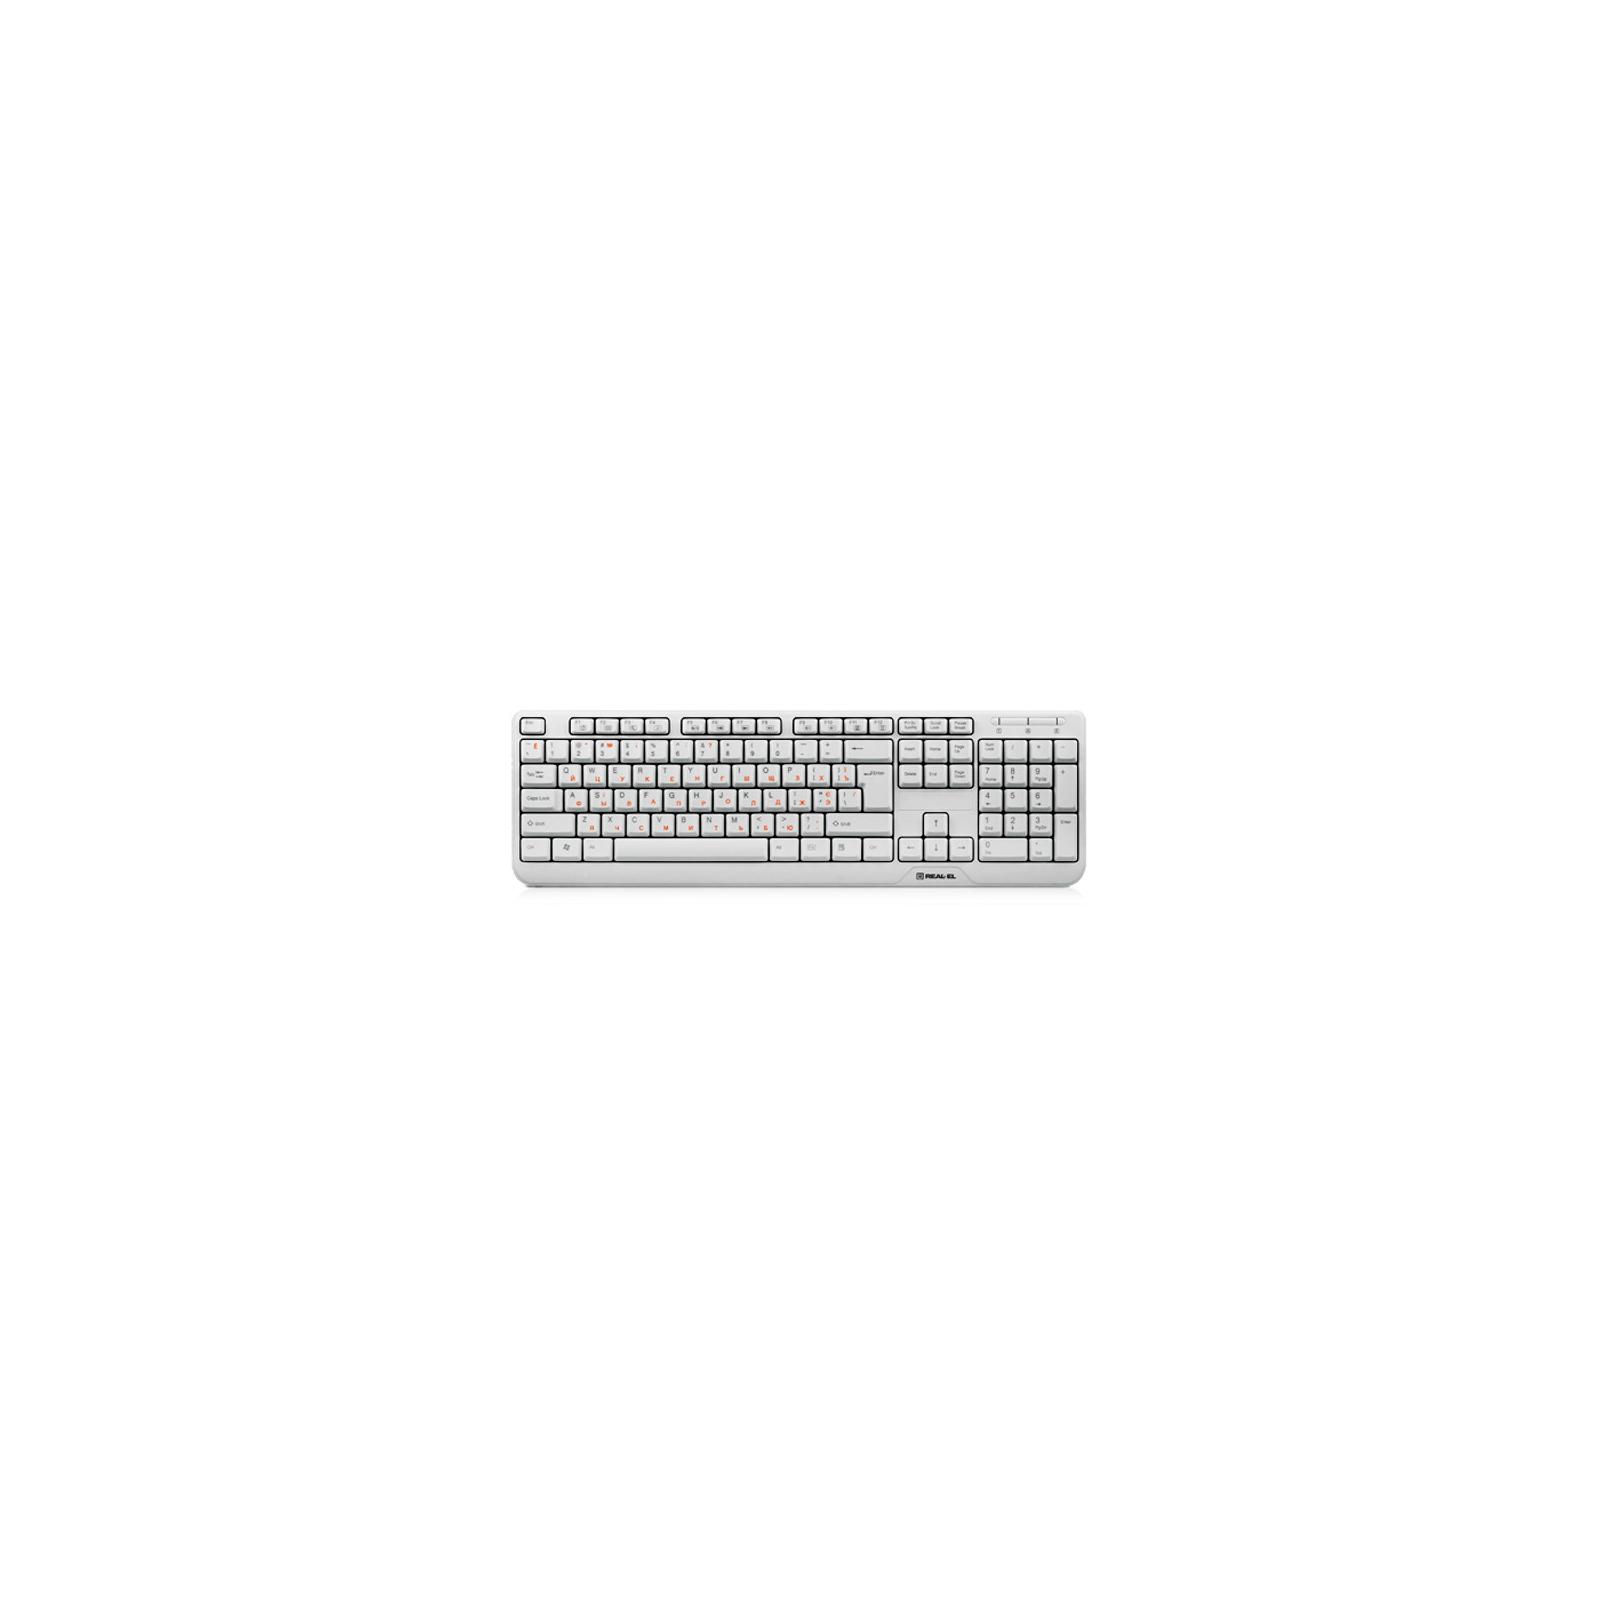 Клавиатура REAL-EL 500 Standard, USB, white